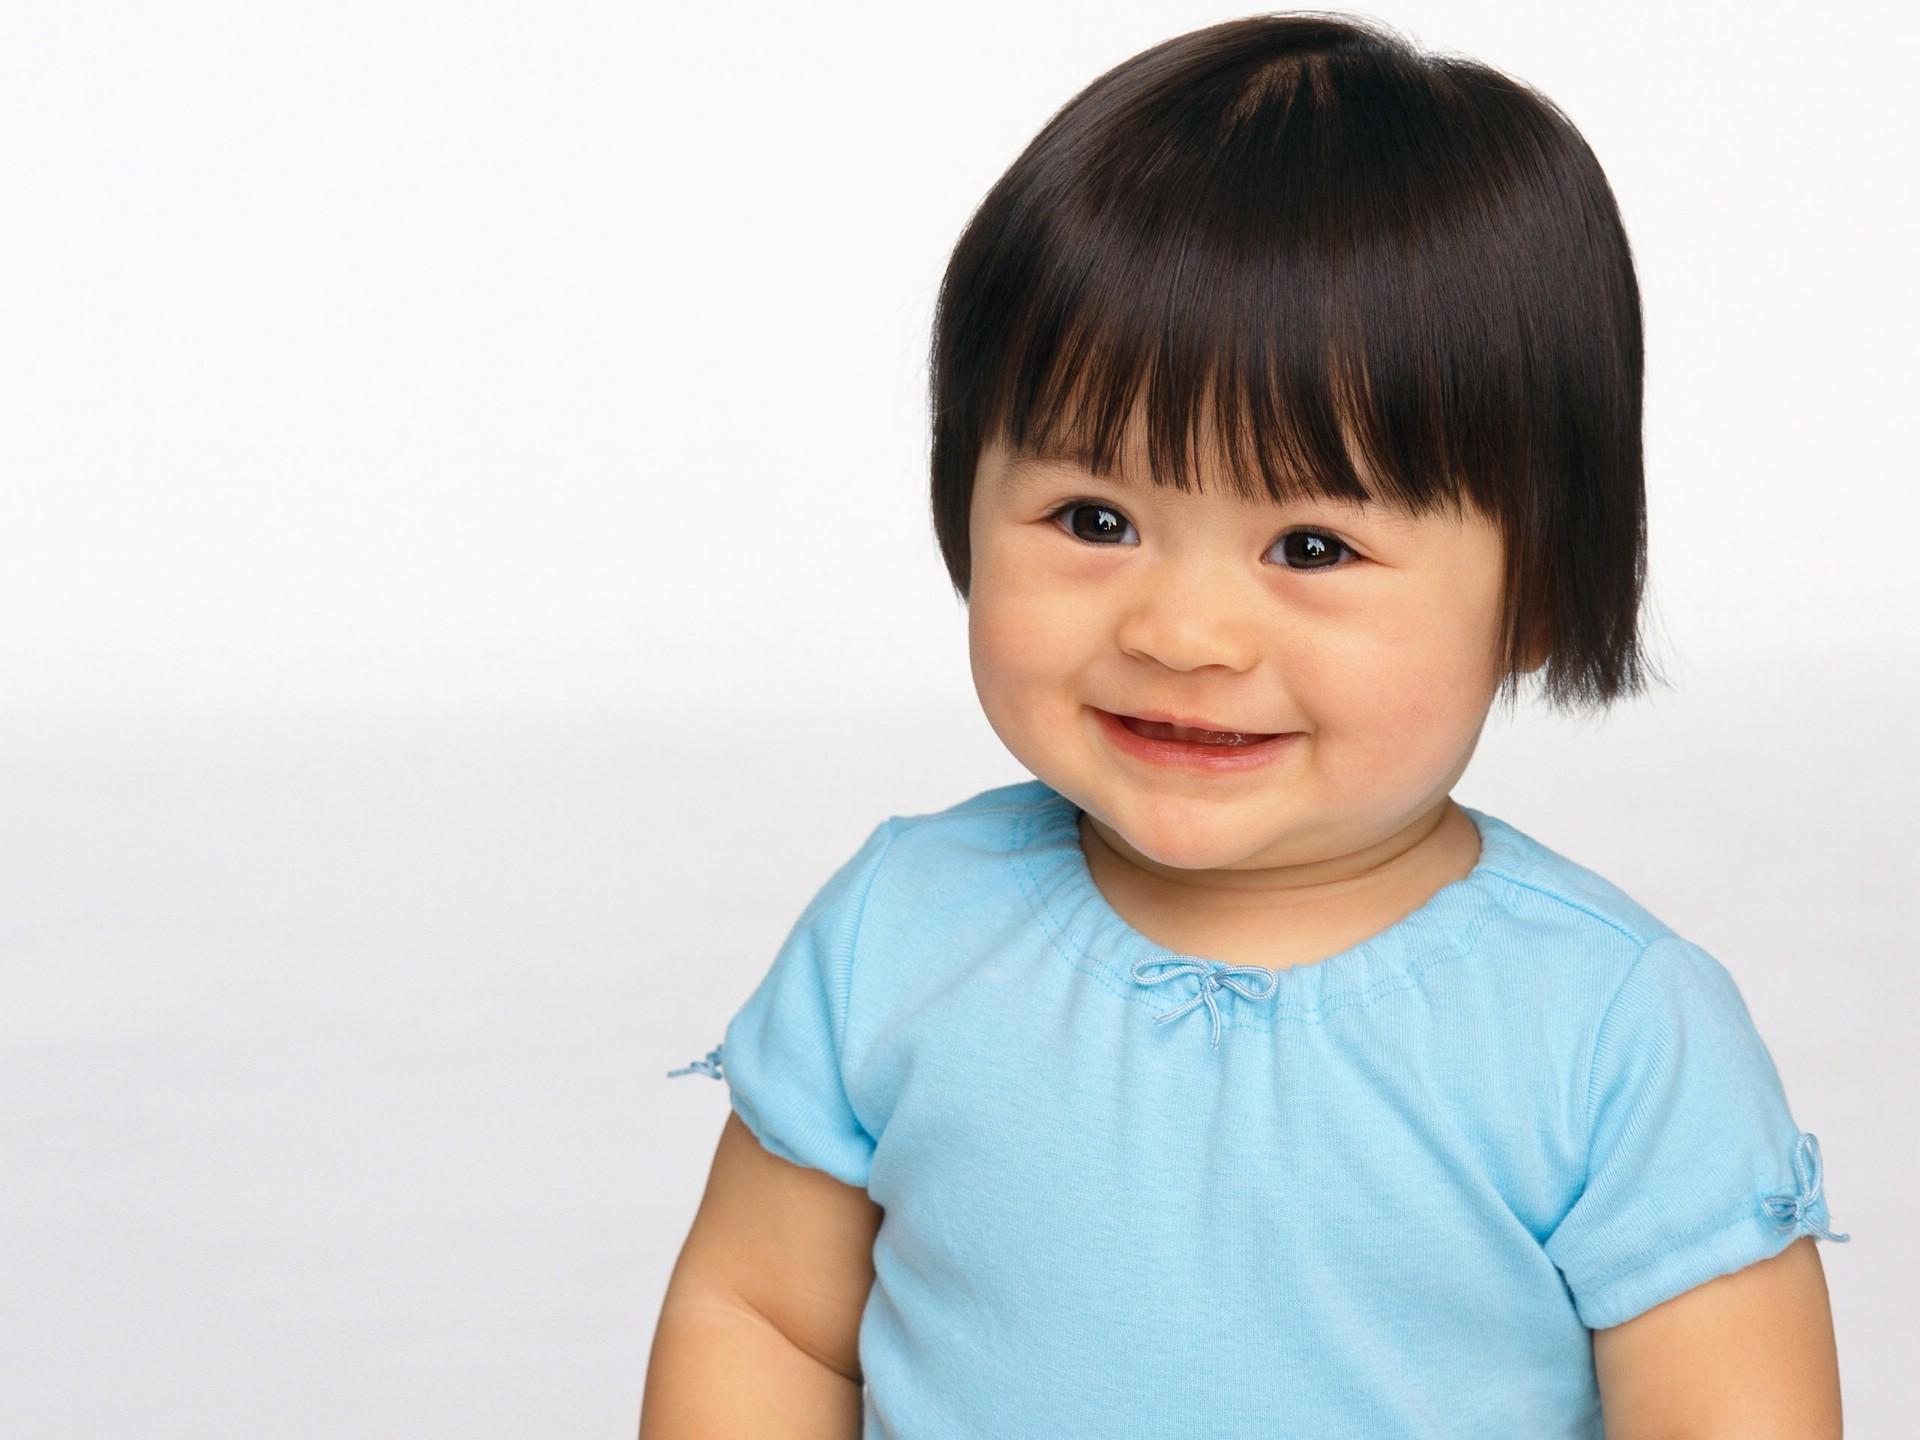 Cute asian Baby High Resolution Computer Wallpapers – https://wallucky.com/